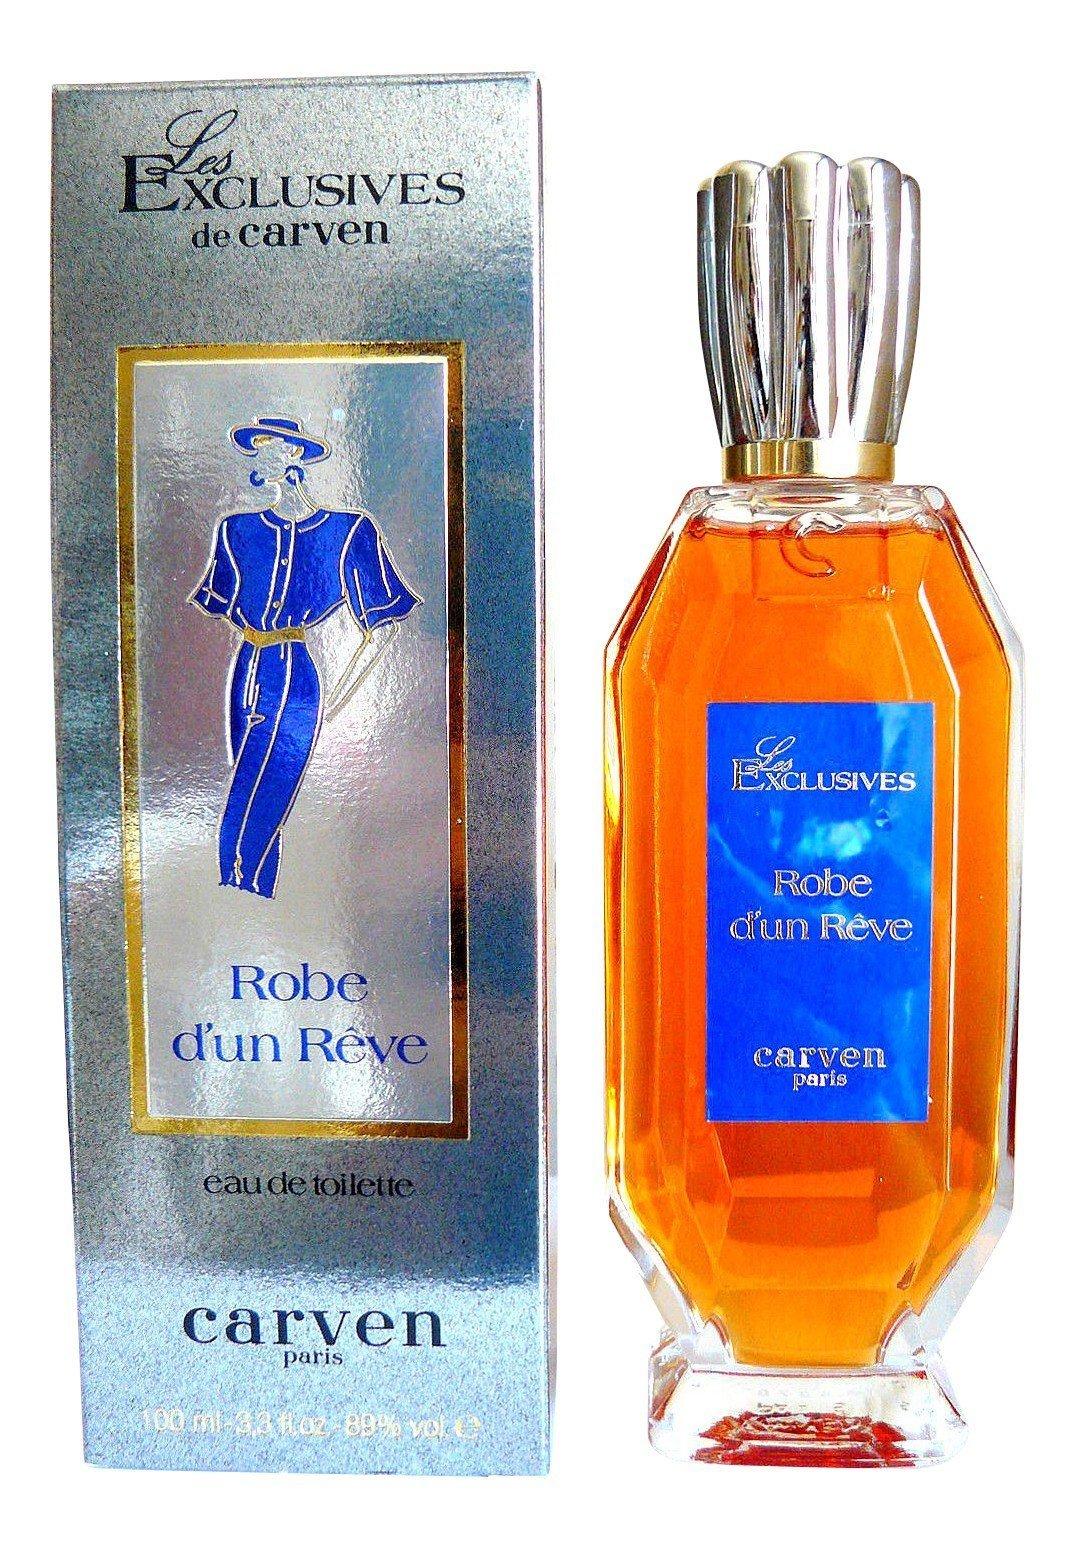 Carven robe d39un reve reviews and rating for Robe de reve